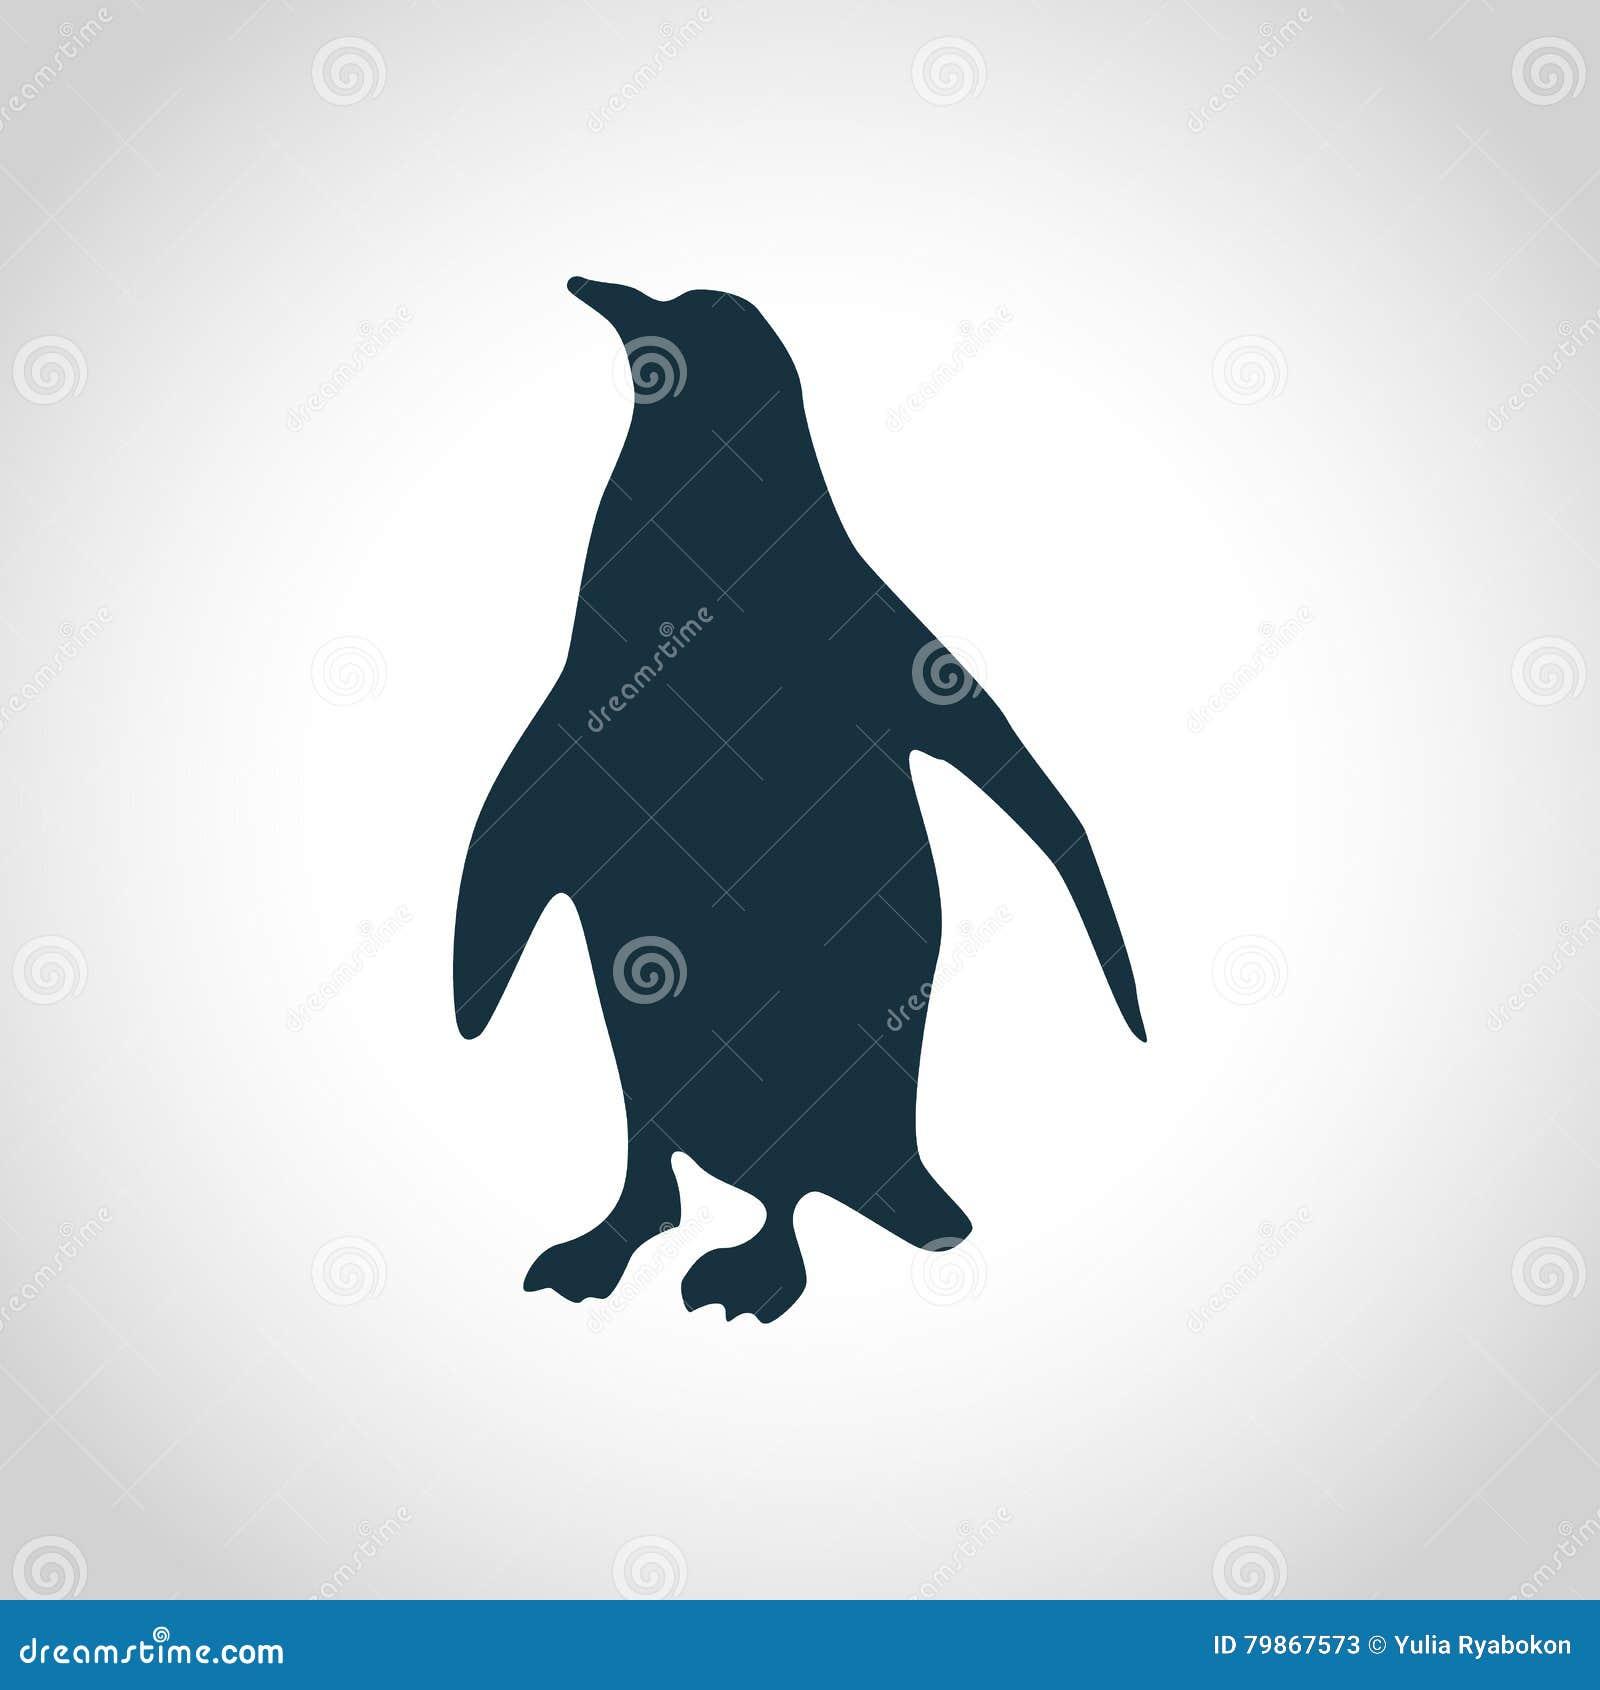 Emperor penguin silhouette